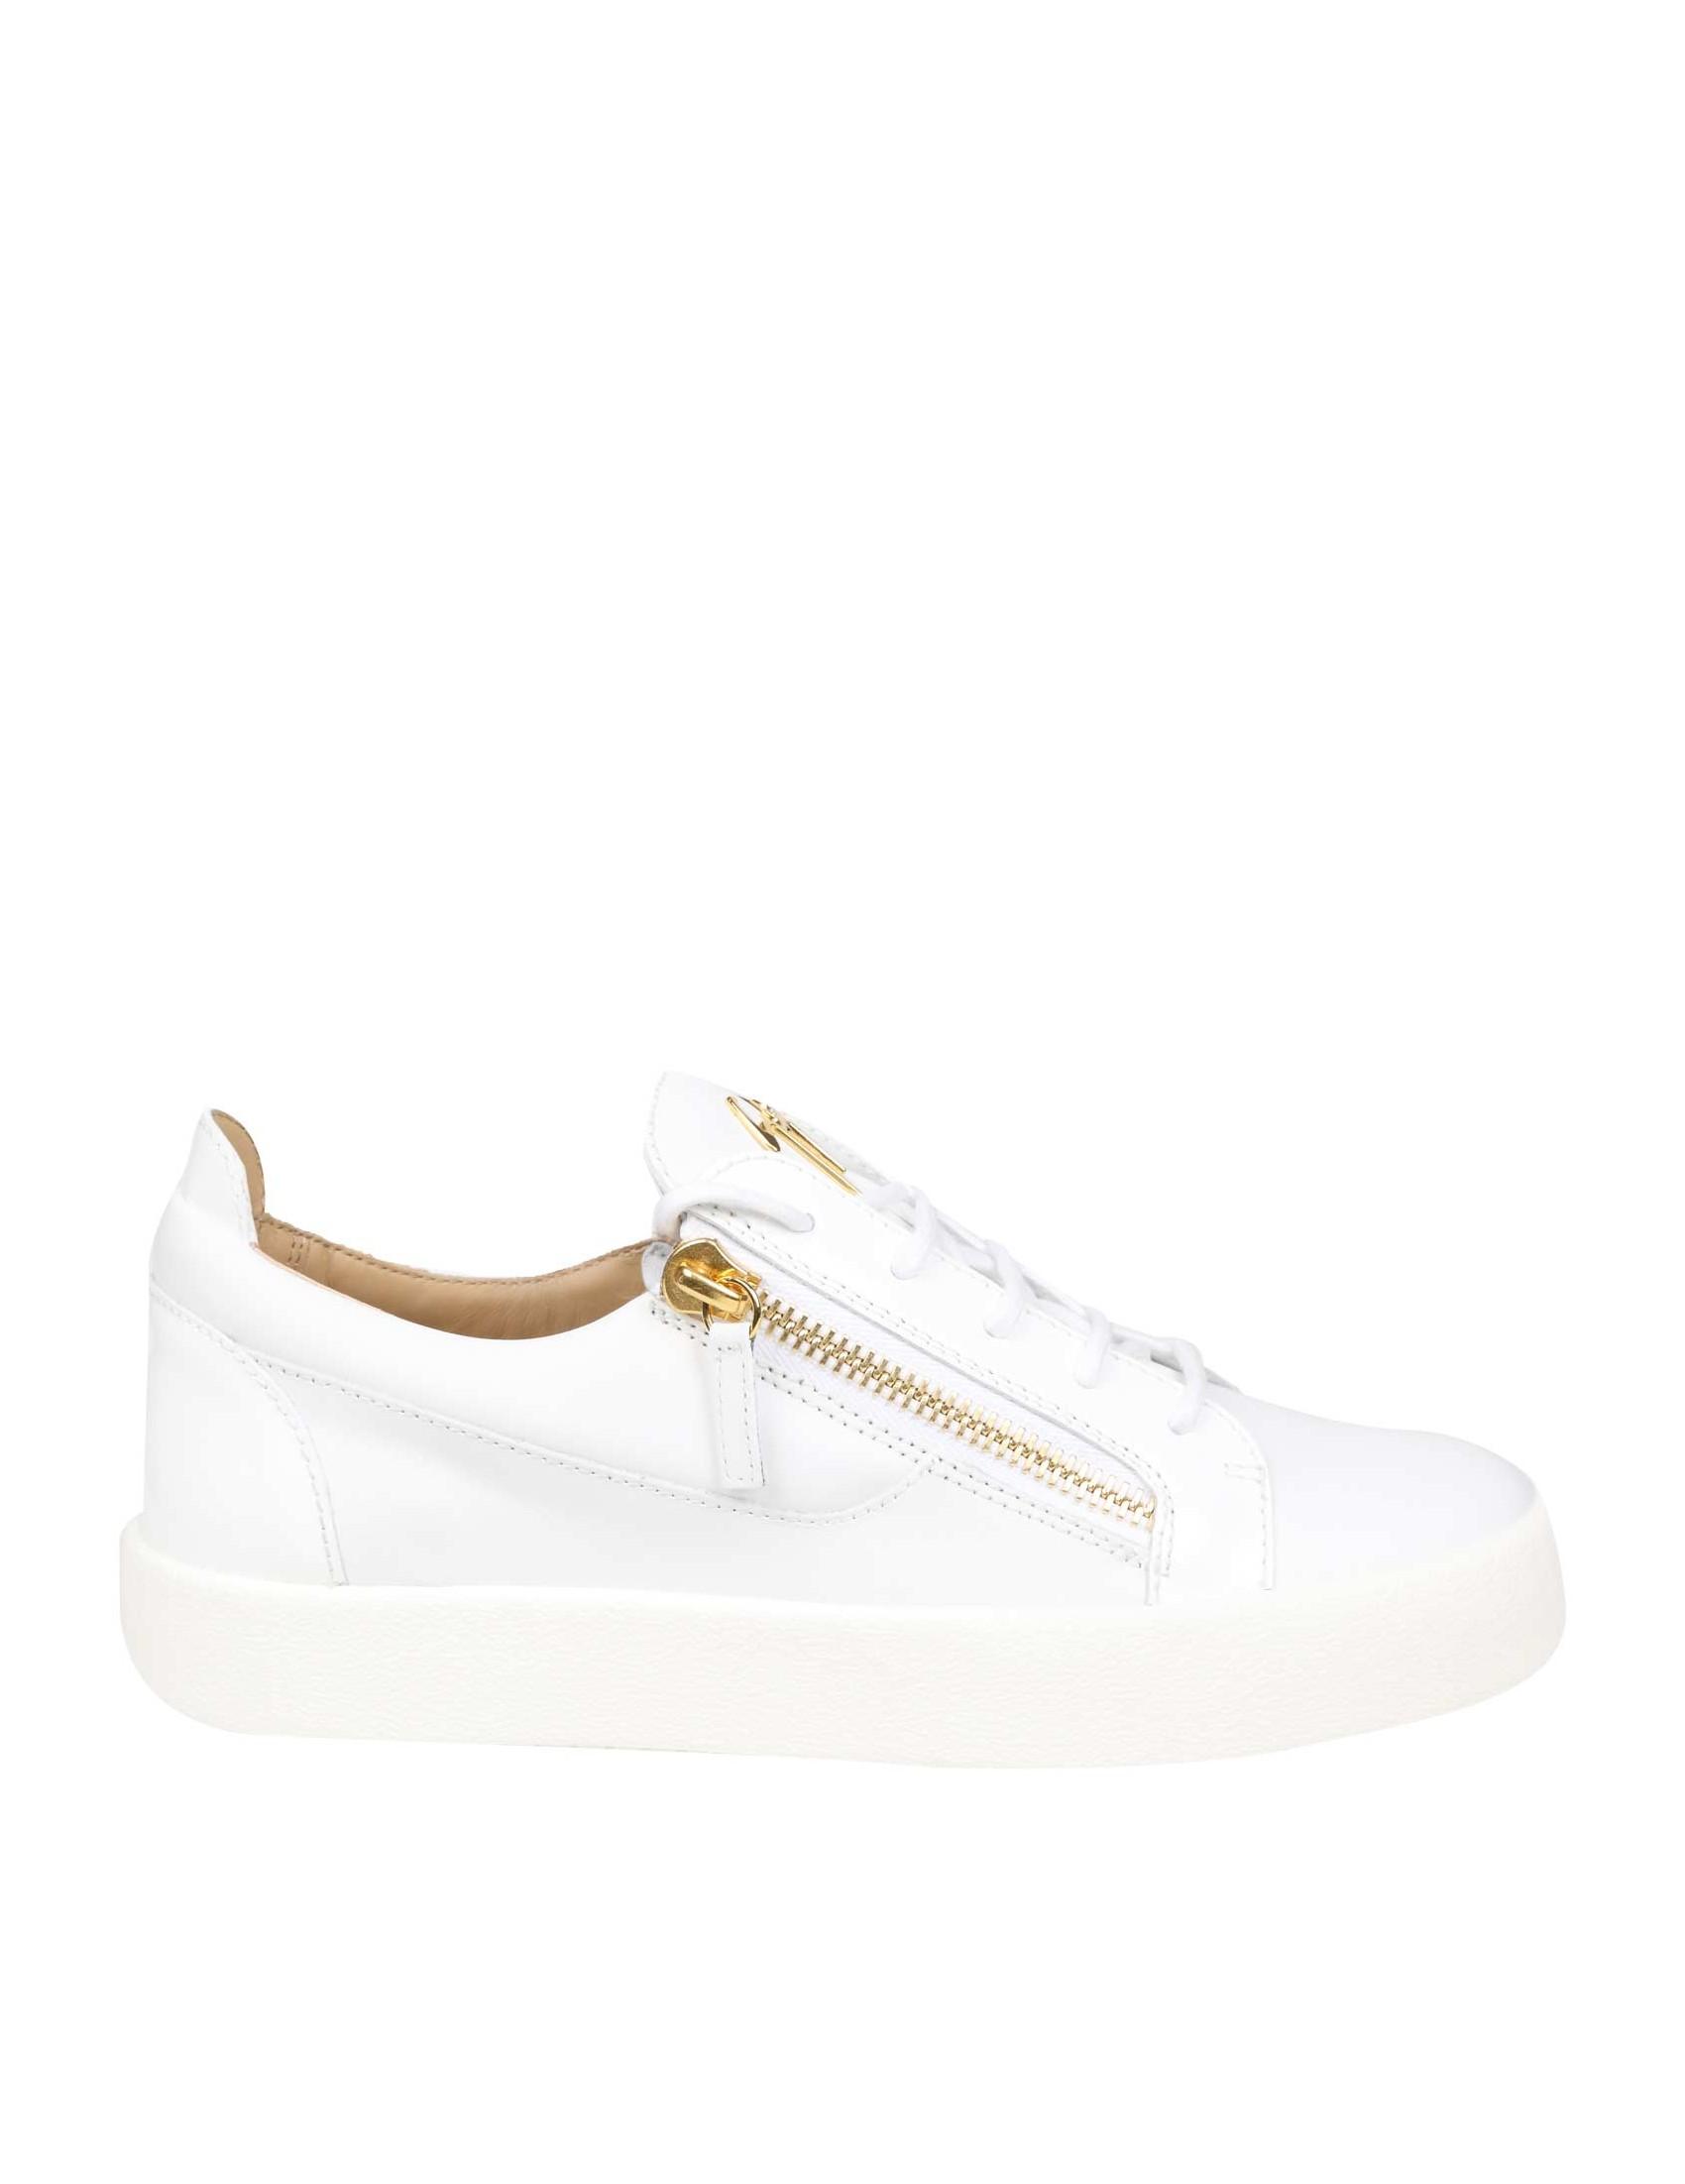 6283a36a44 giuseppe-zanotti-design-sneakers-frankie-in-pelle-colore-bianco.jpg